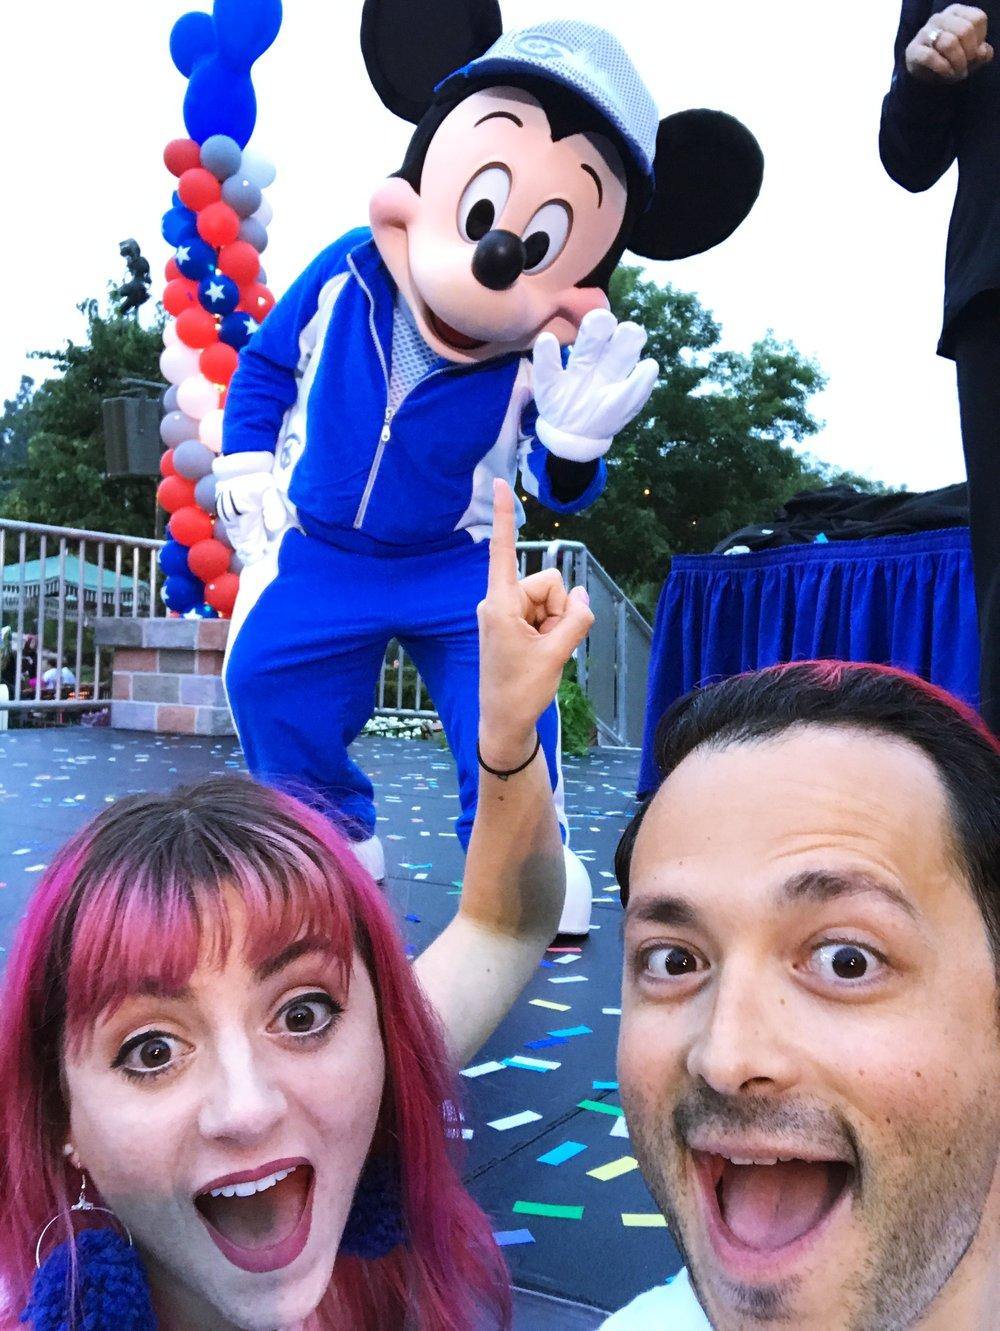 Hiiiiii Mickey!